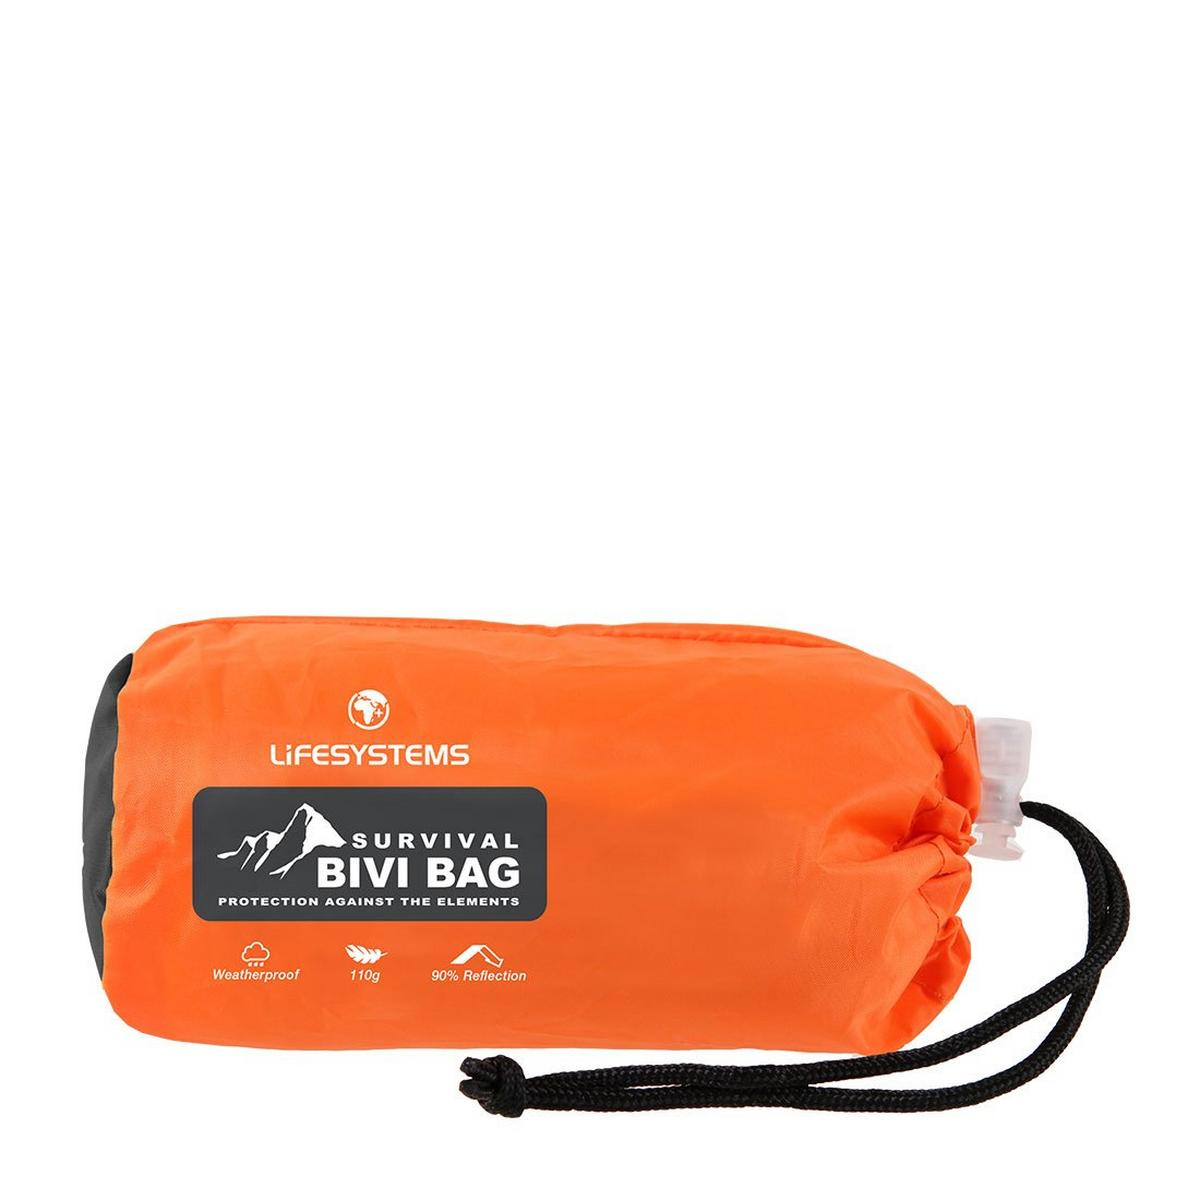 Lifesystems Light And Dry Thermal Bivi Bag